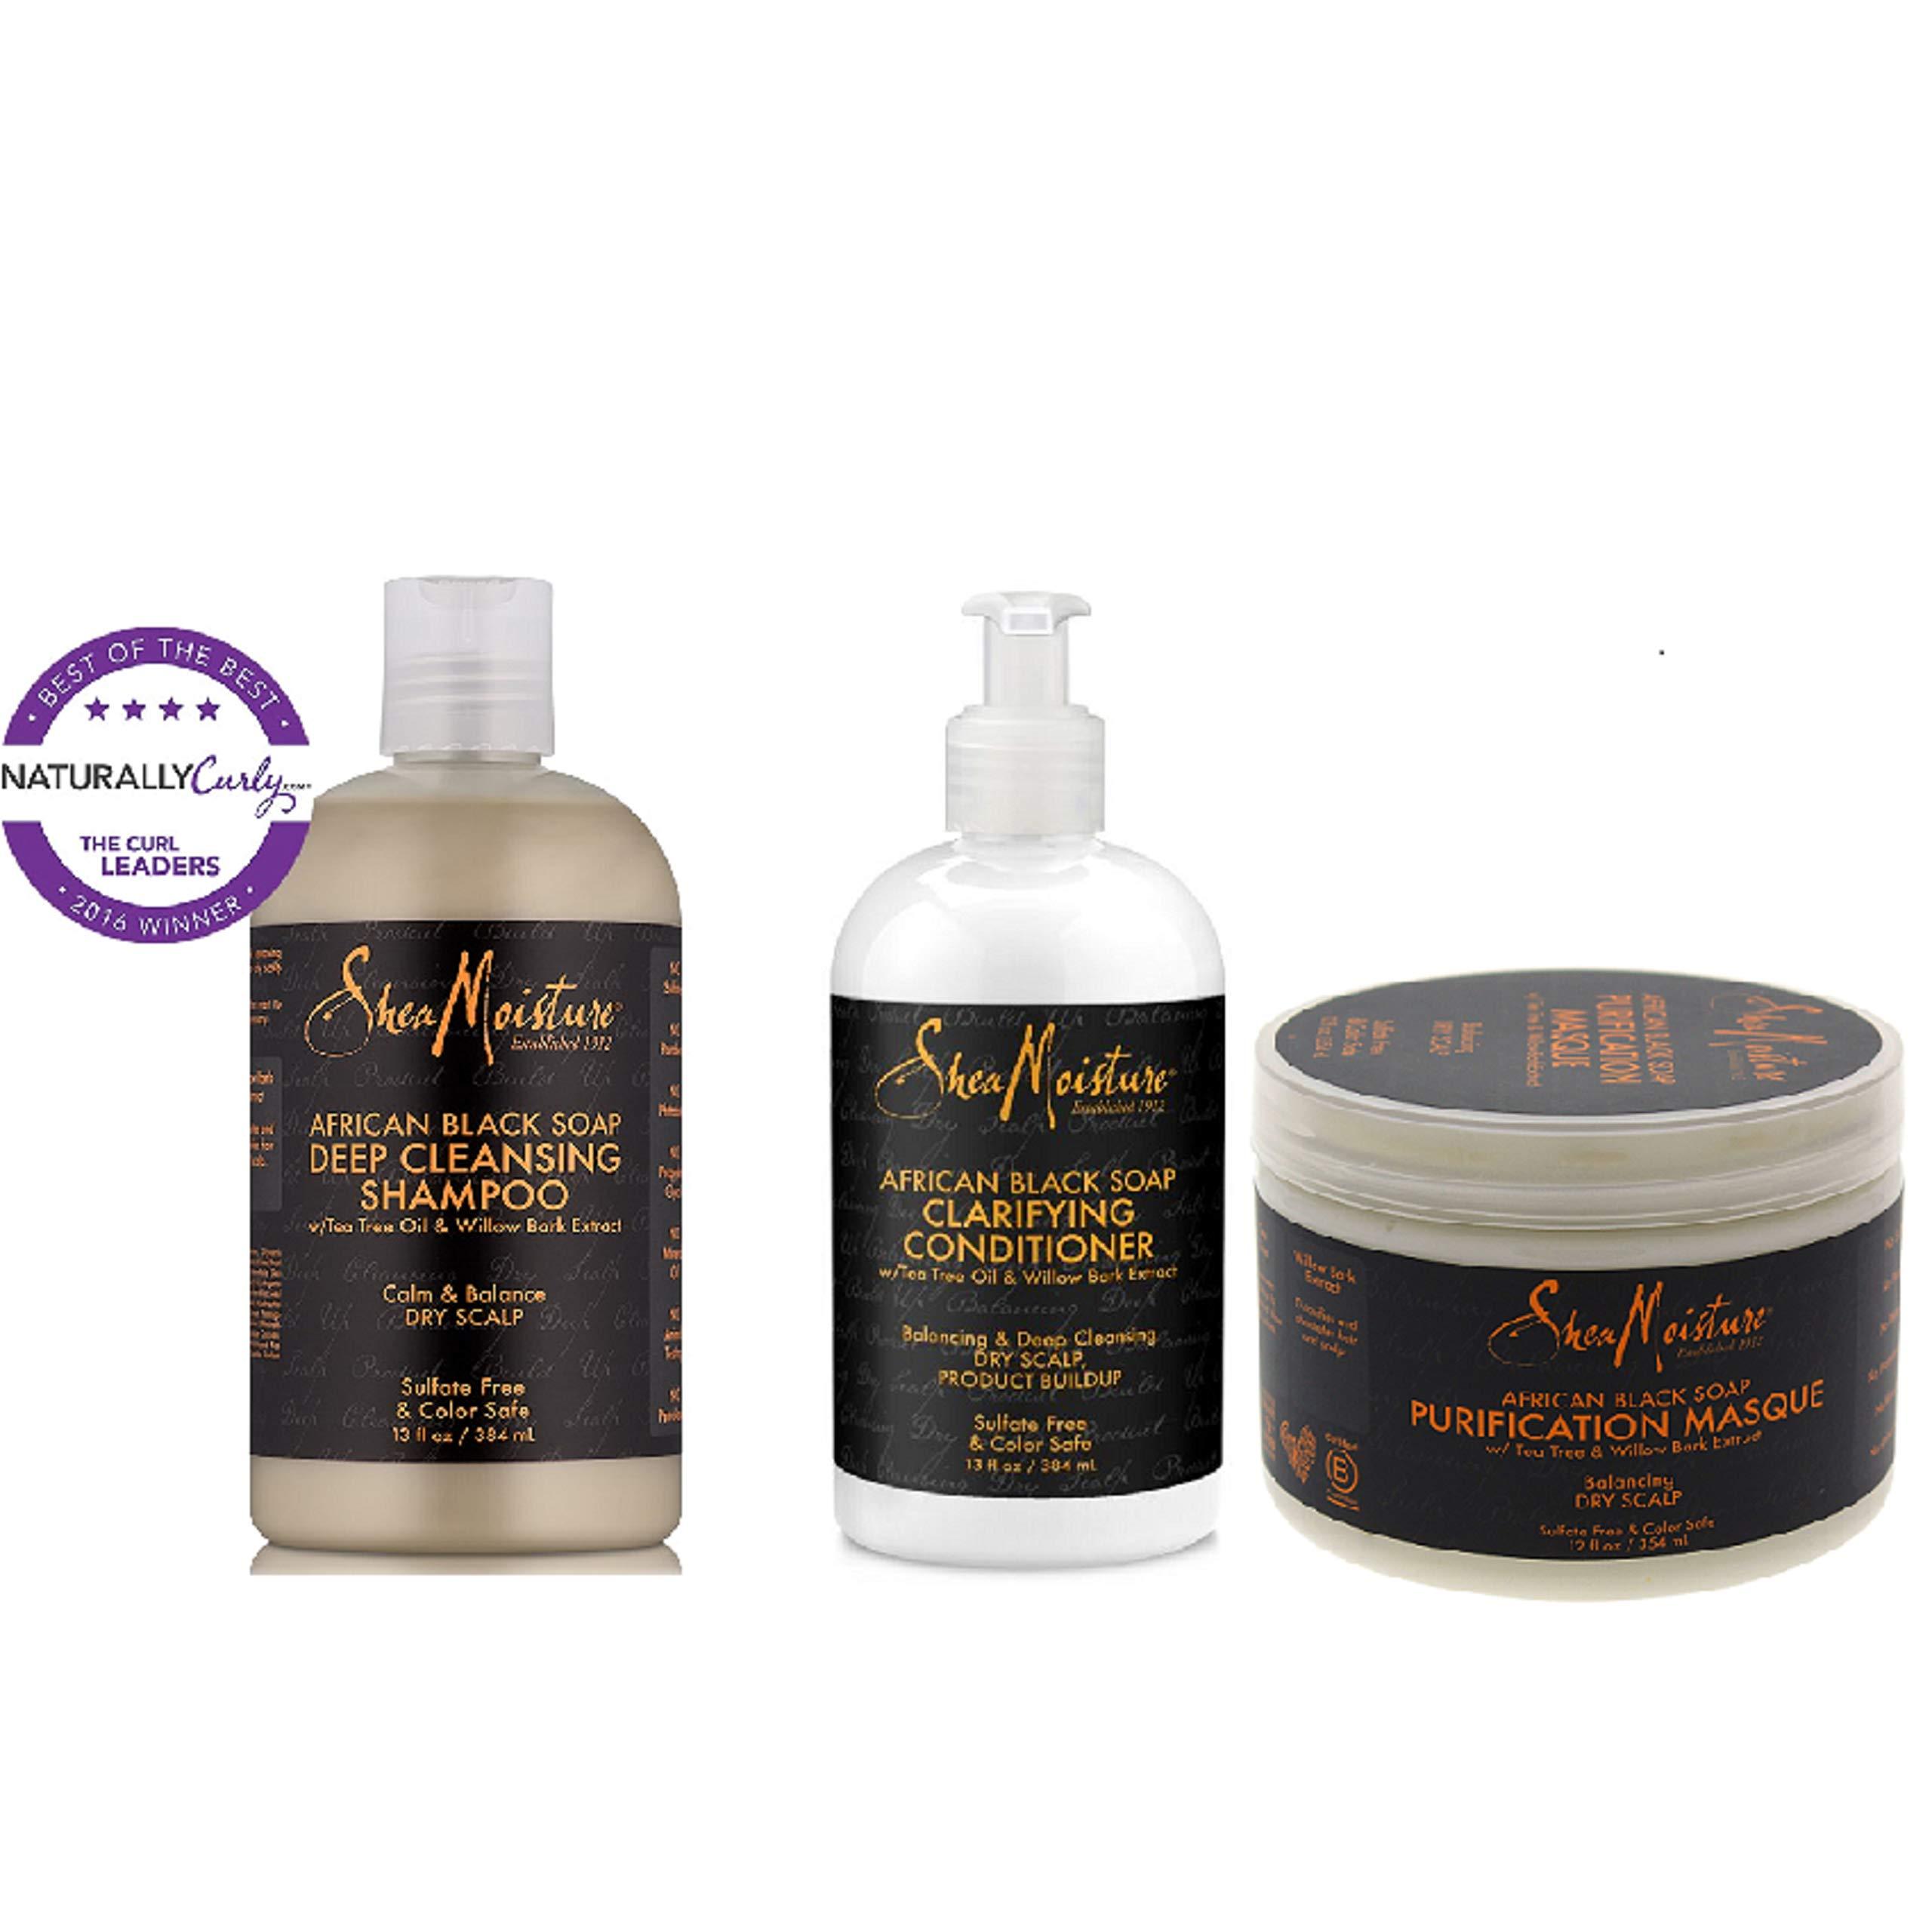 Shea Moisture African Black Soap Set II-Shampoo 13oz+Conditioner 13oz+Masque 12oz by Shea Moisture